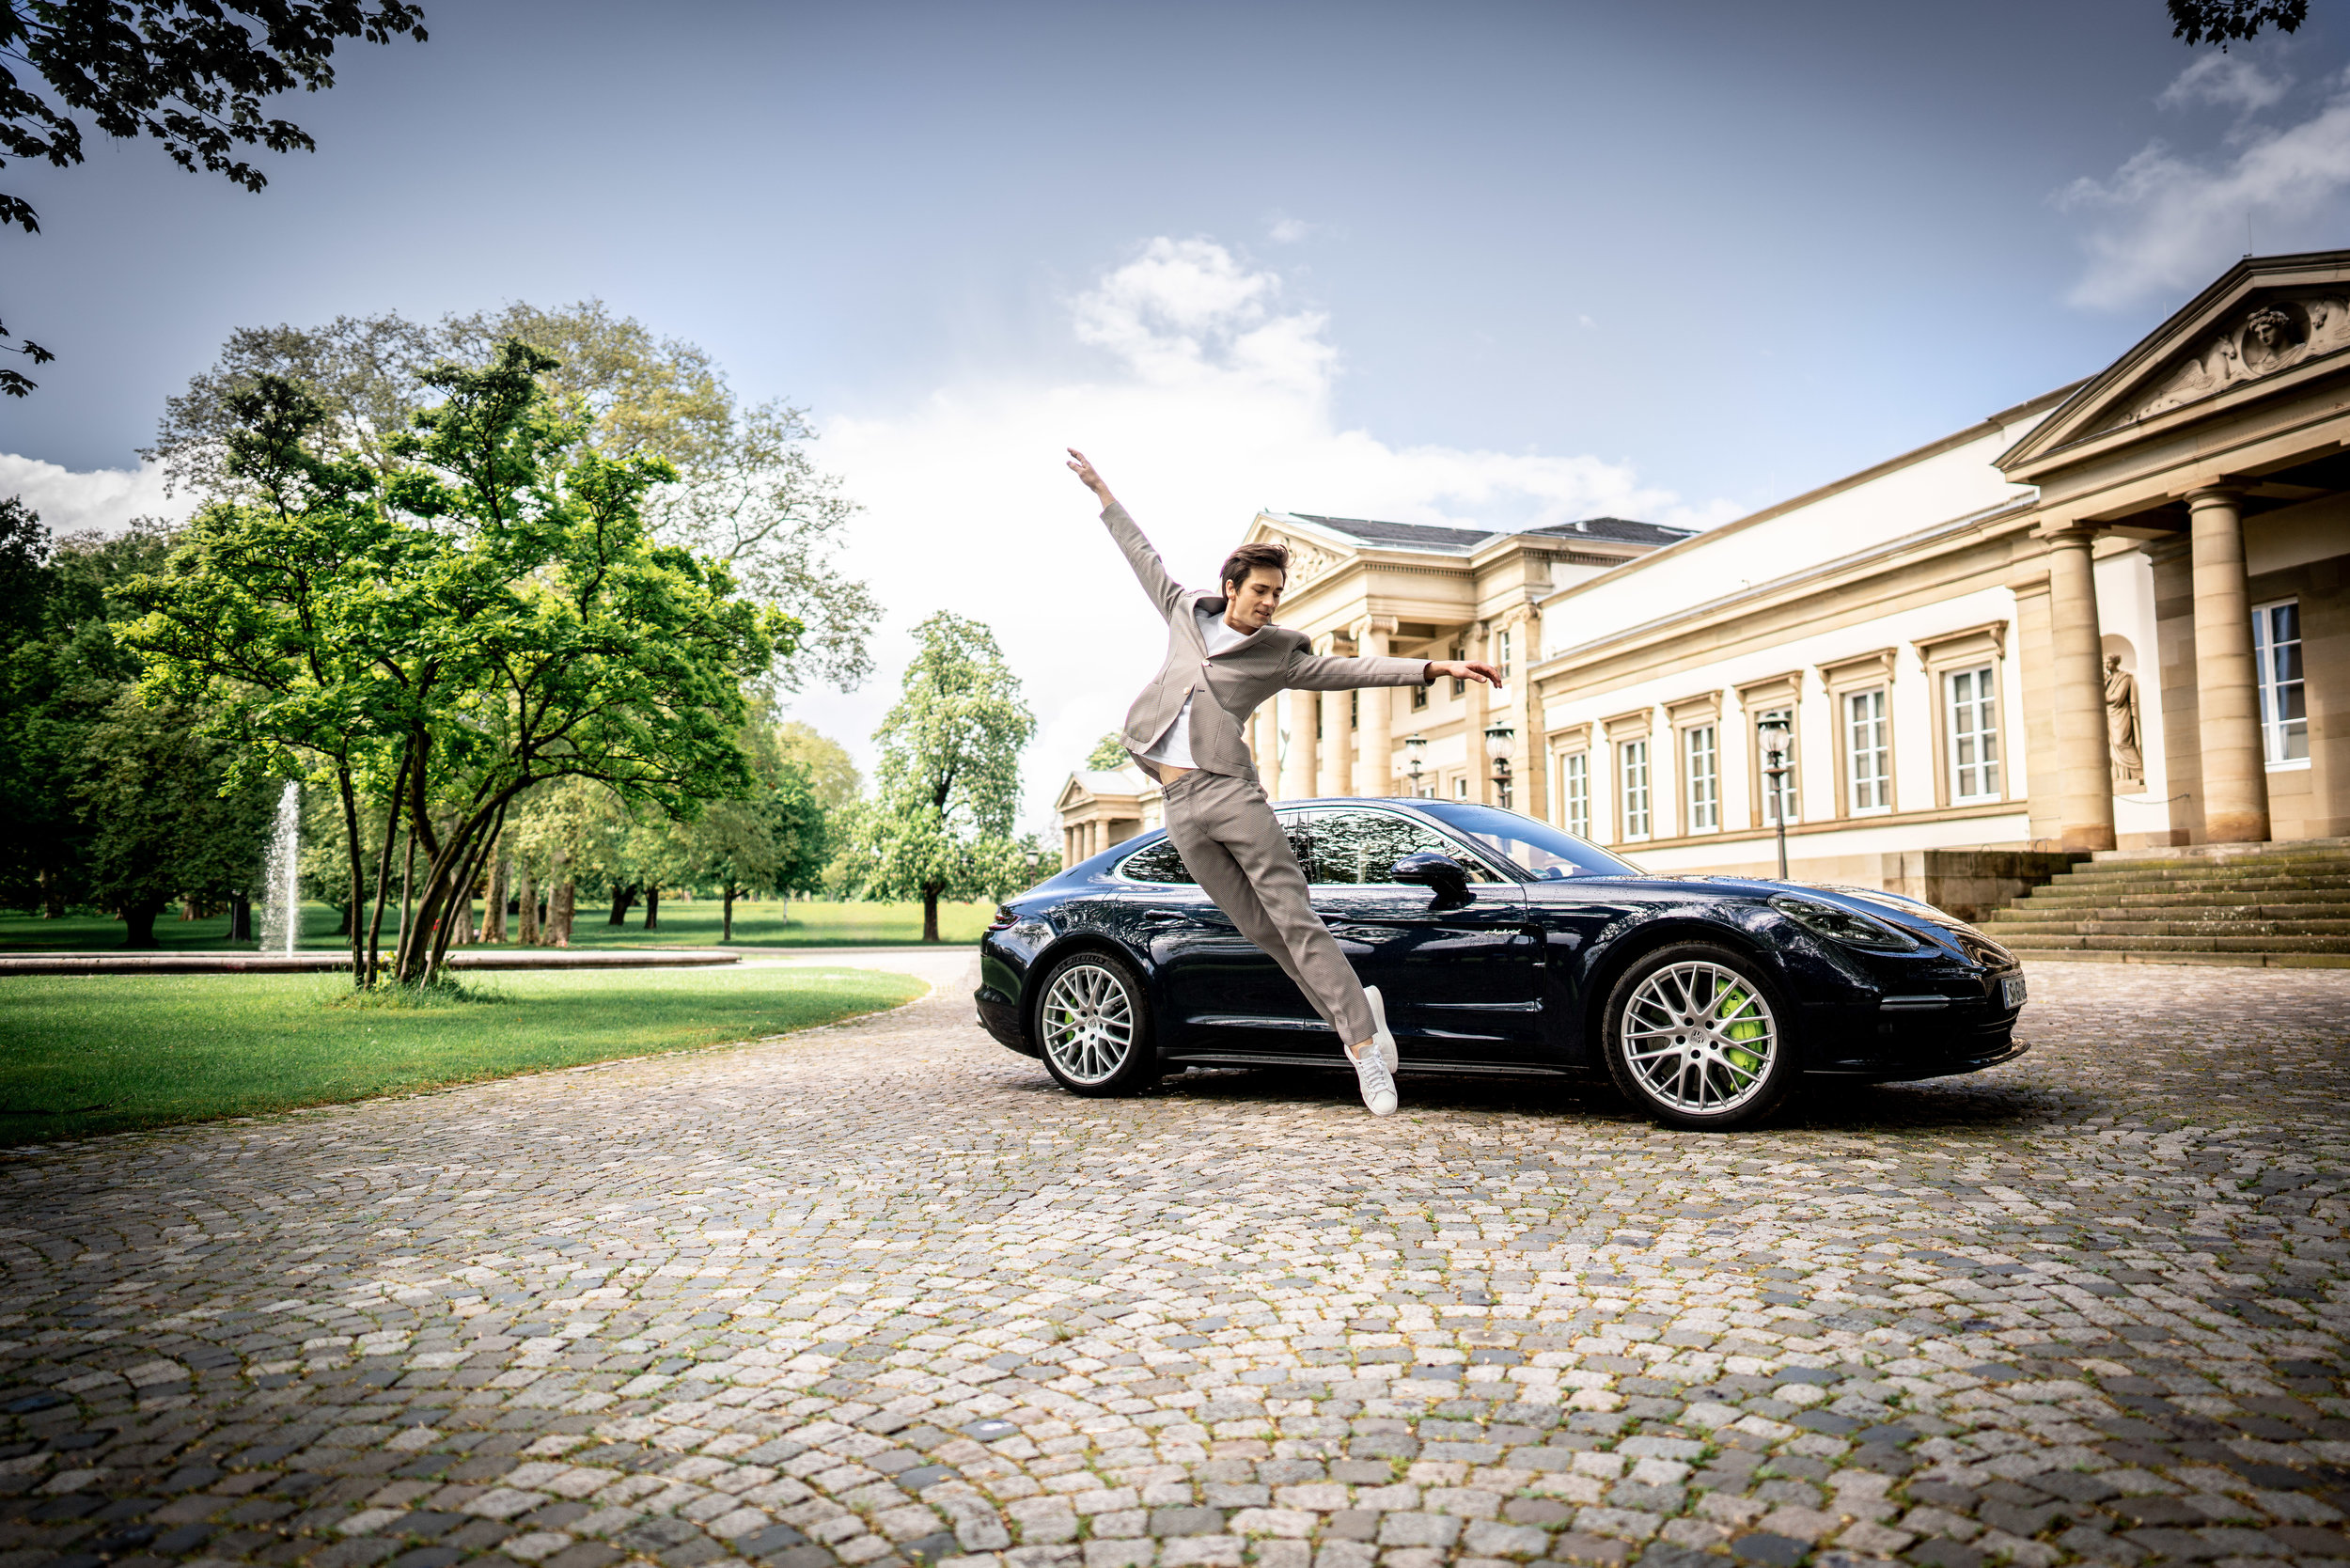 Friedemann Vogel Porsche Spotify list